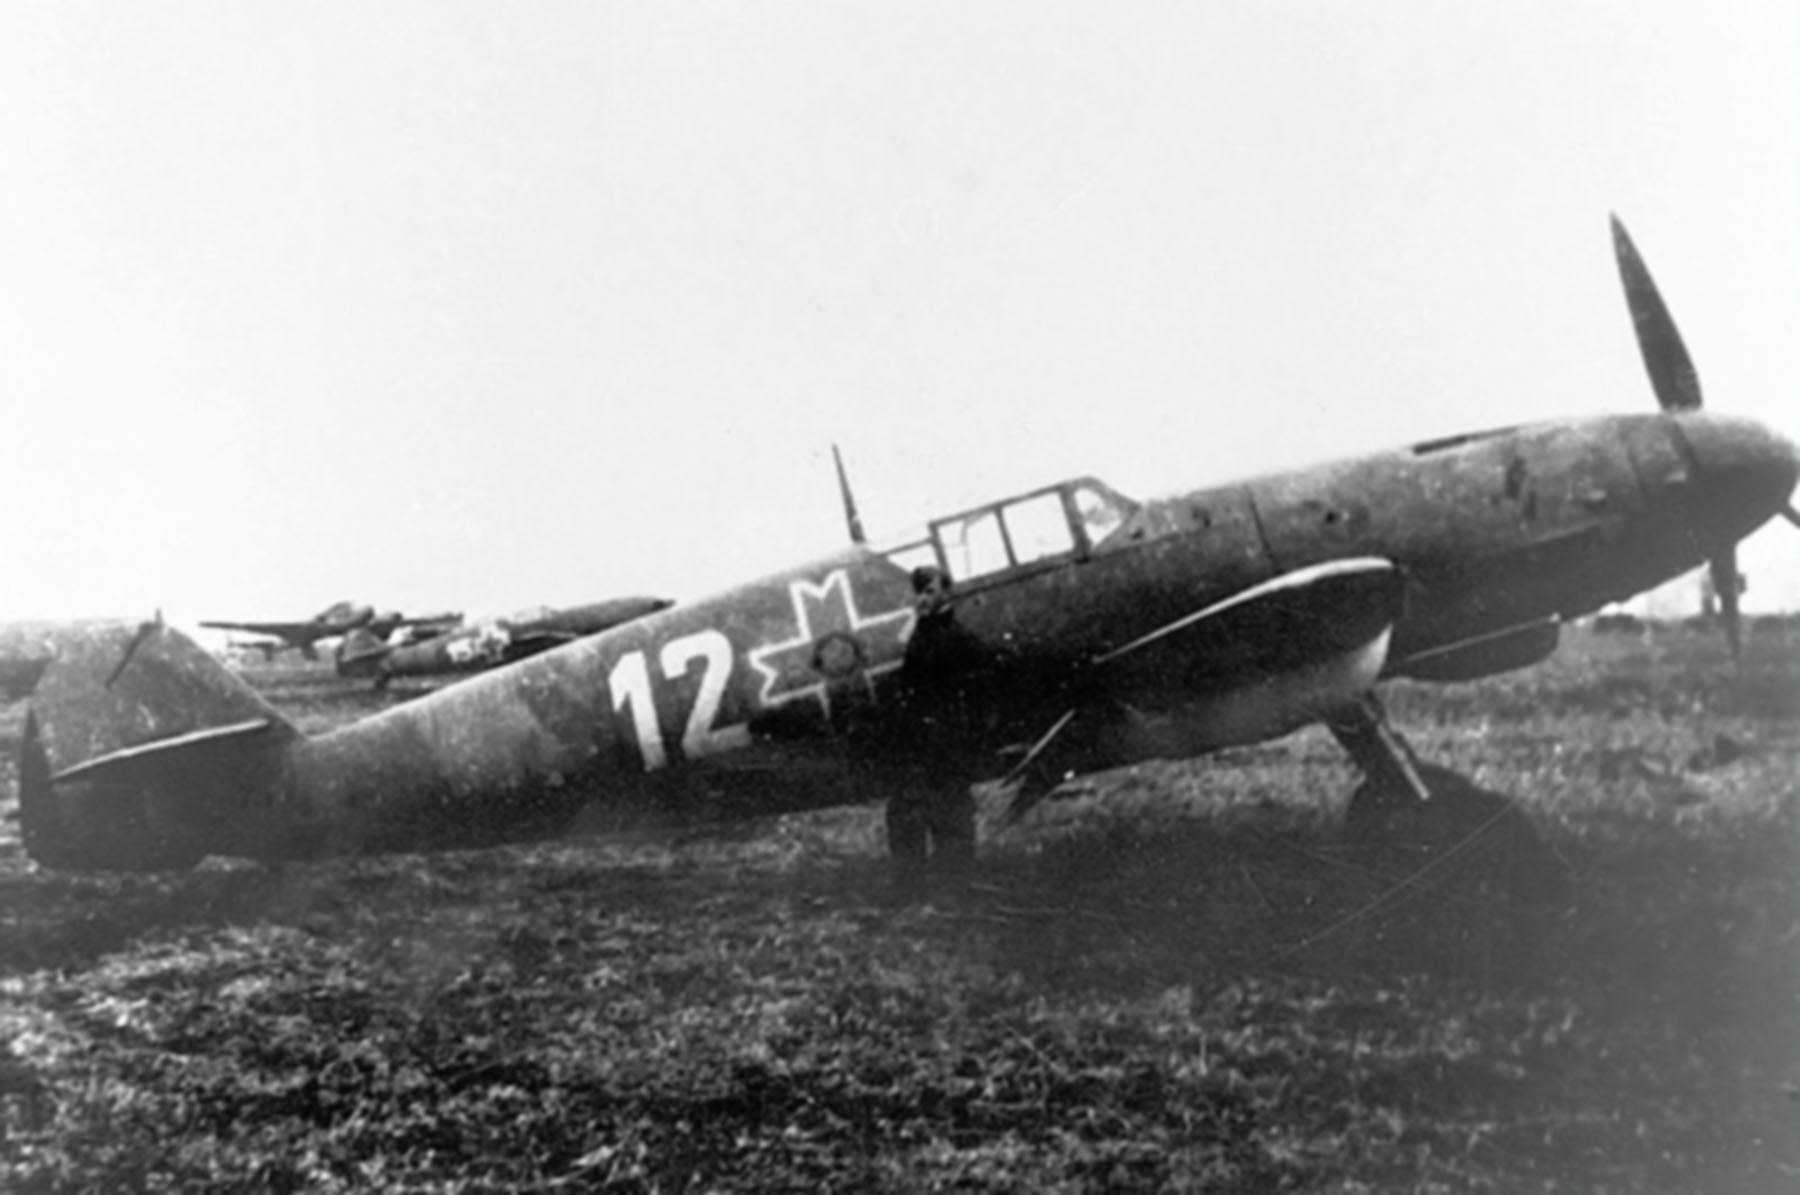 Messerschmitt Bf 109G2R6 RRAF White 12 Esc 53 Gr7 Lt Maga airfield spring 1944 01